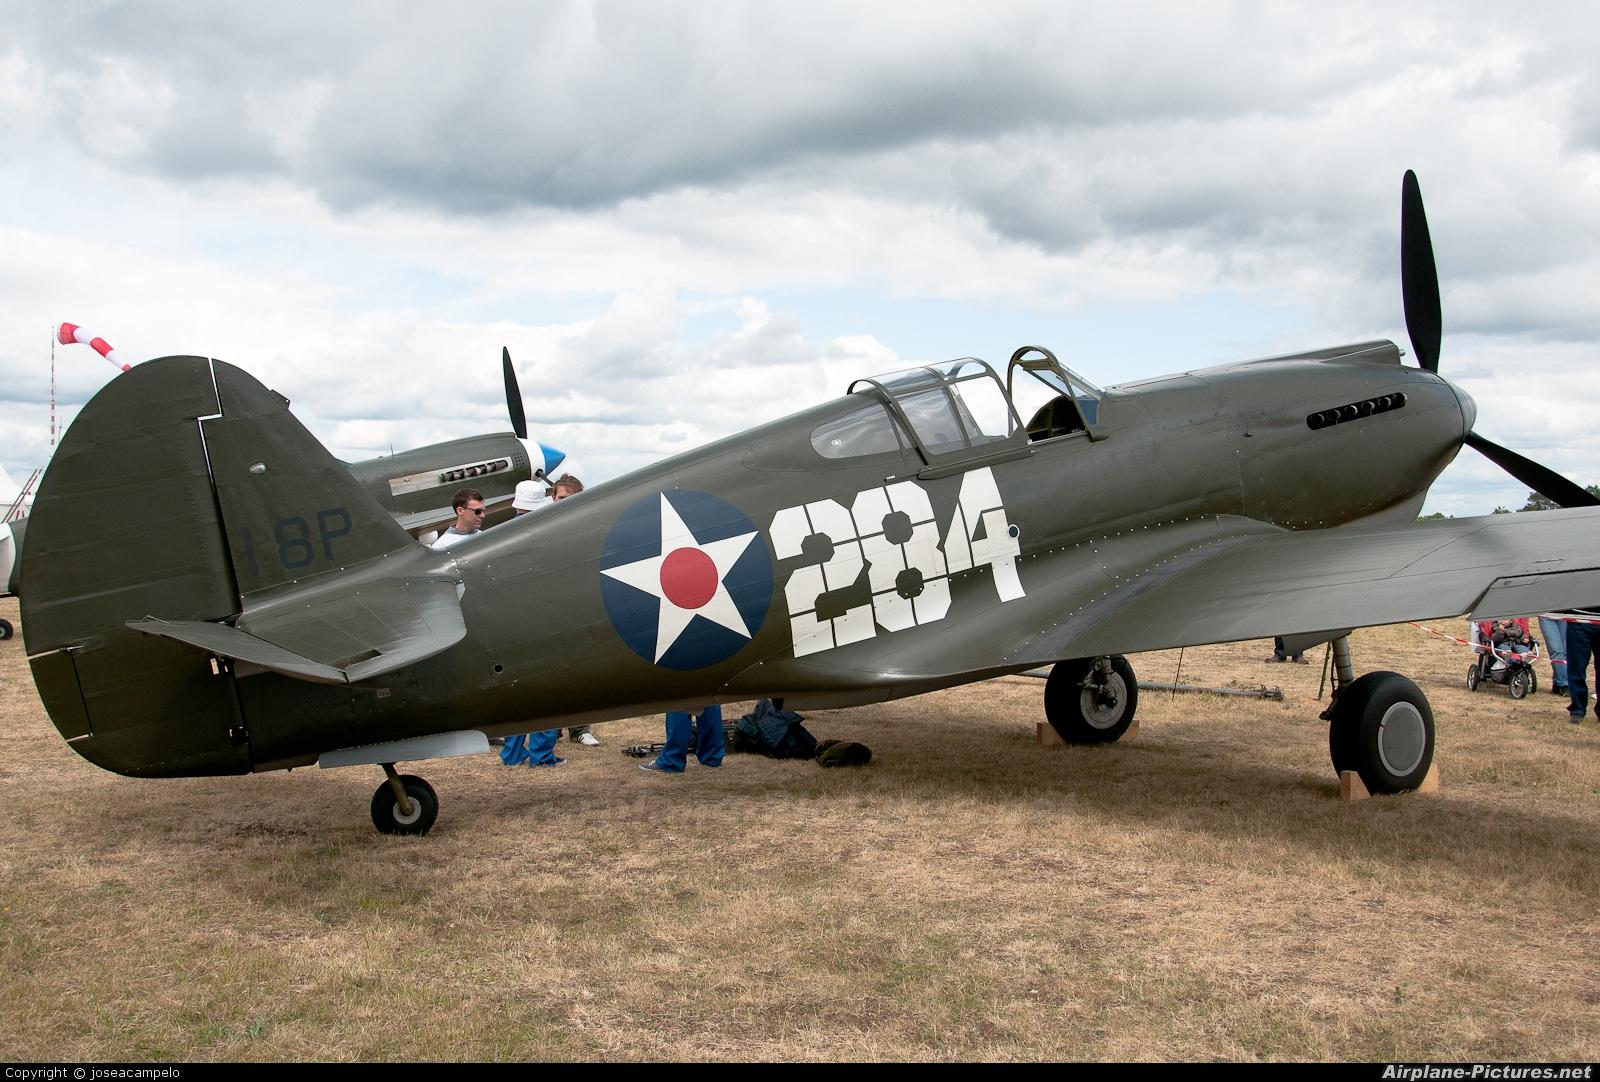 Patina G-CDWH aircraft at La Ferté-Alais